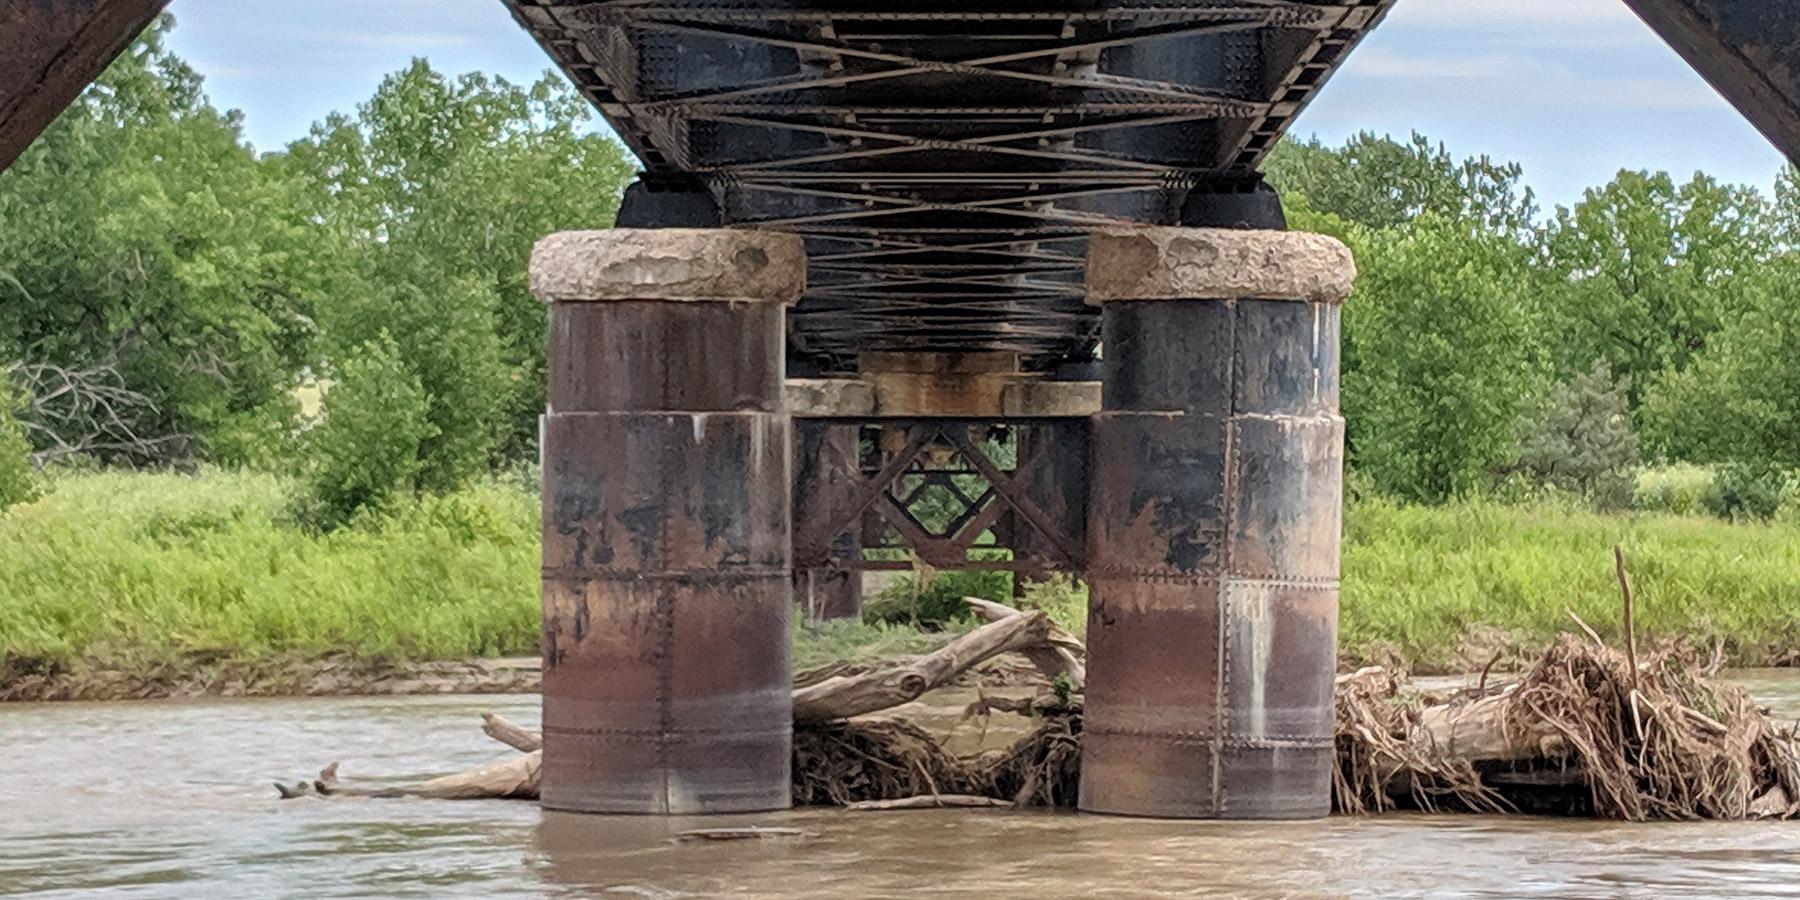 Bridge Monitoring